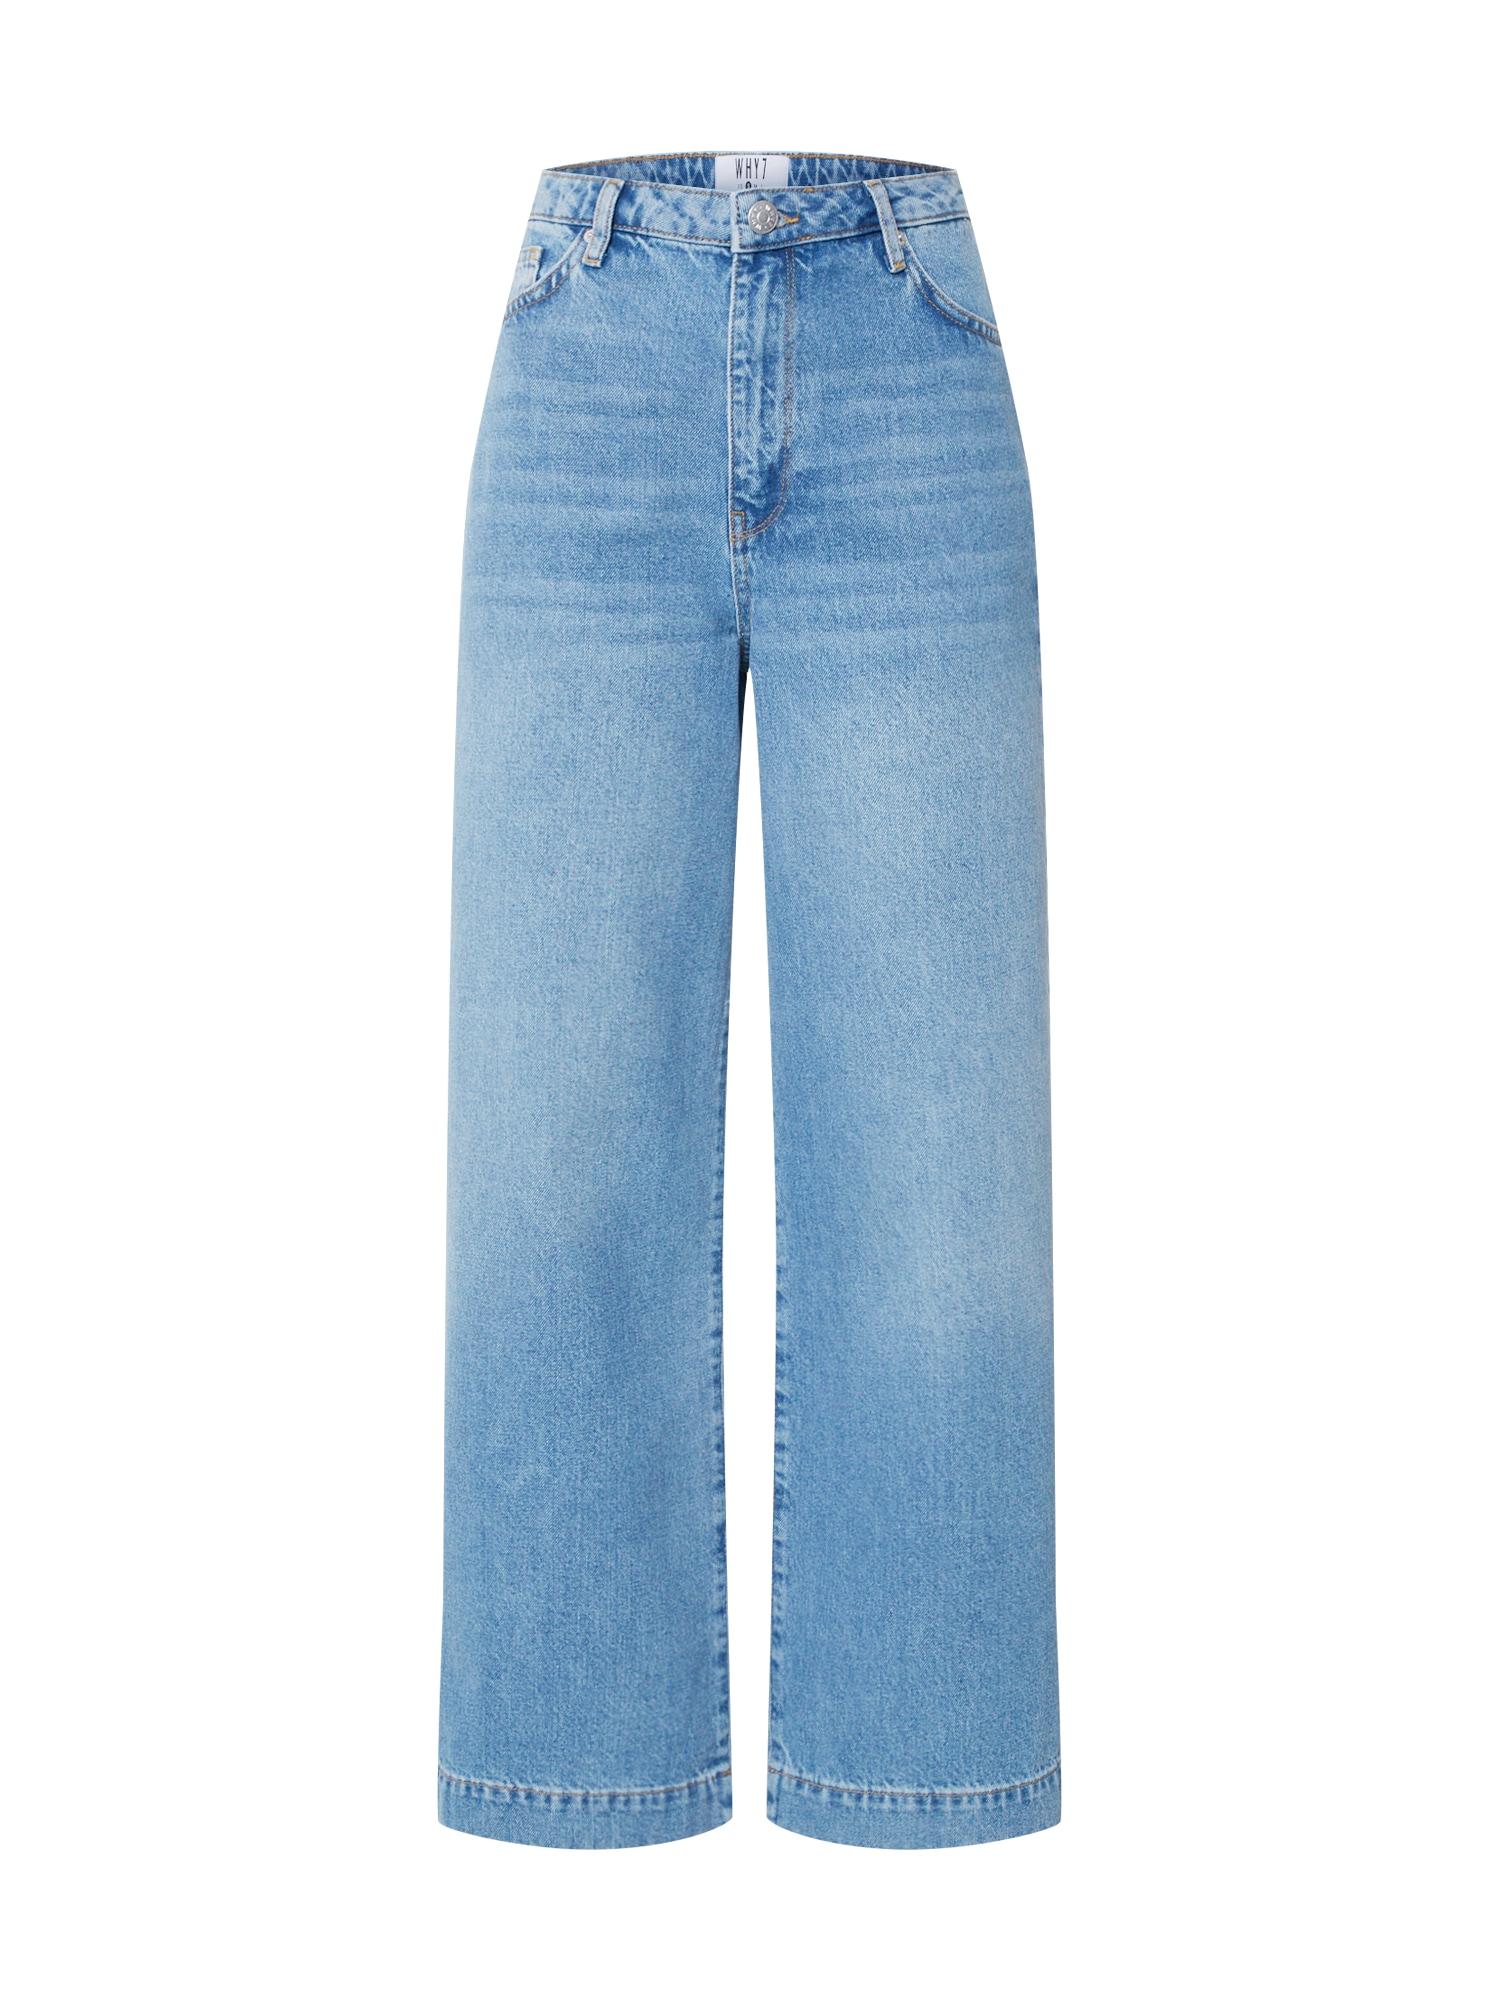 WHY7 Džinsai 'Milla' tamsiai (džinso) mėlyna